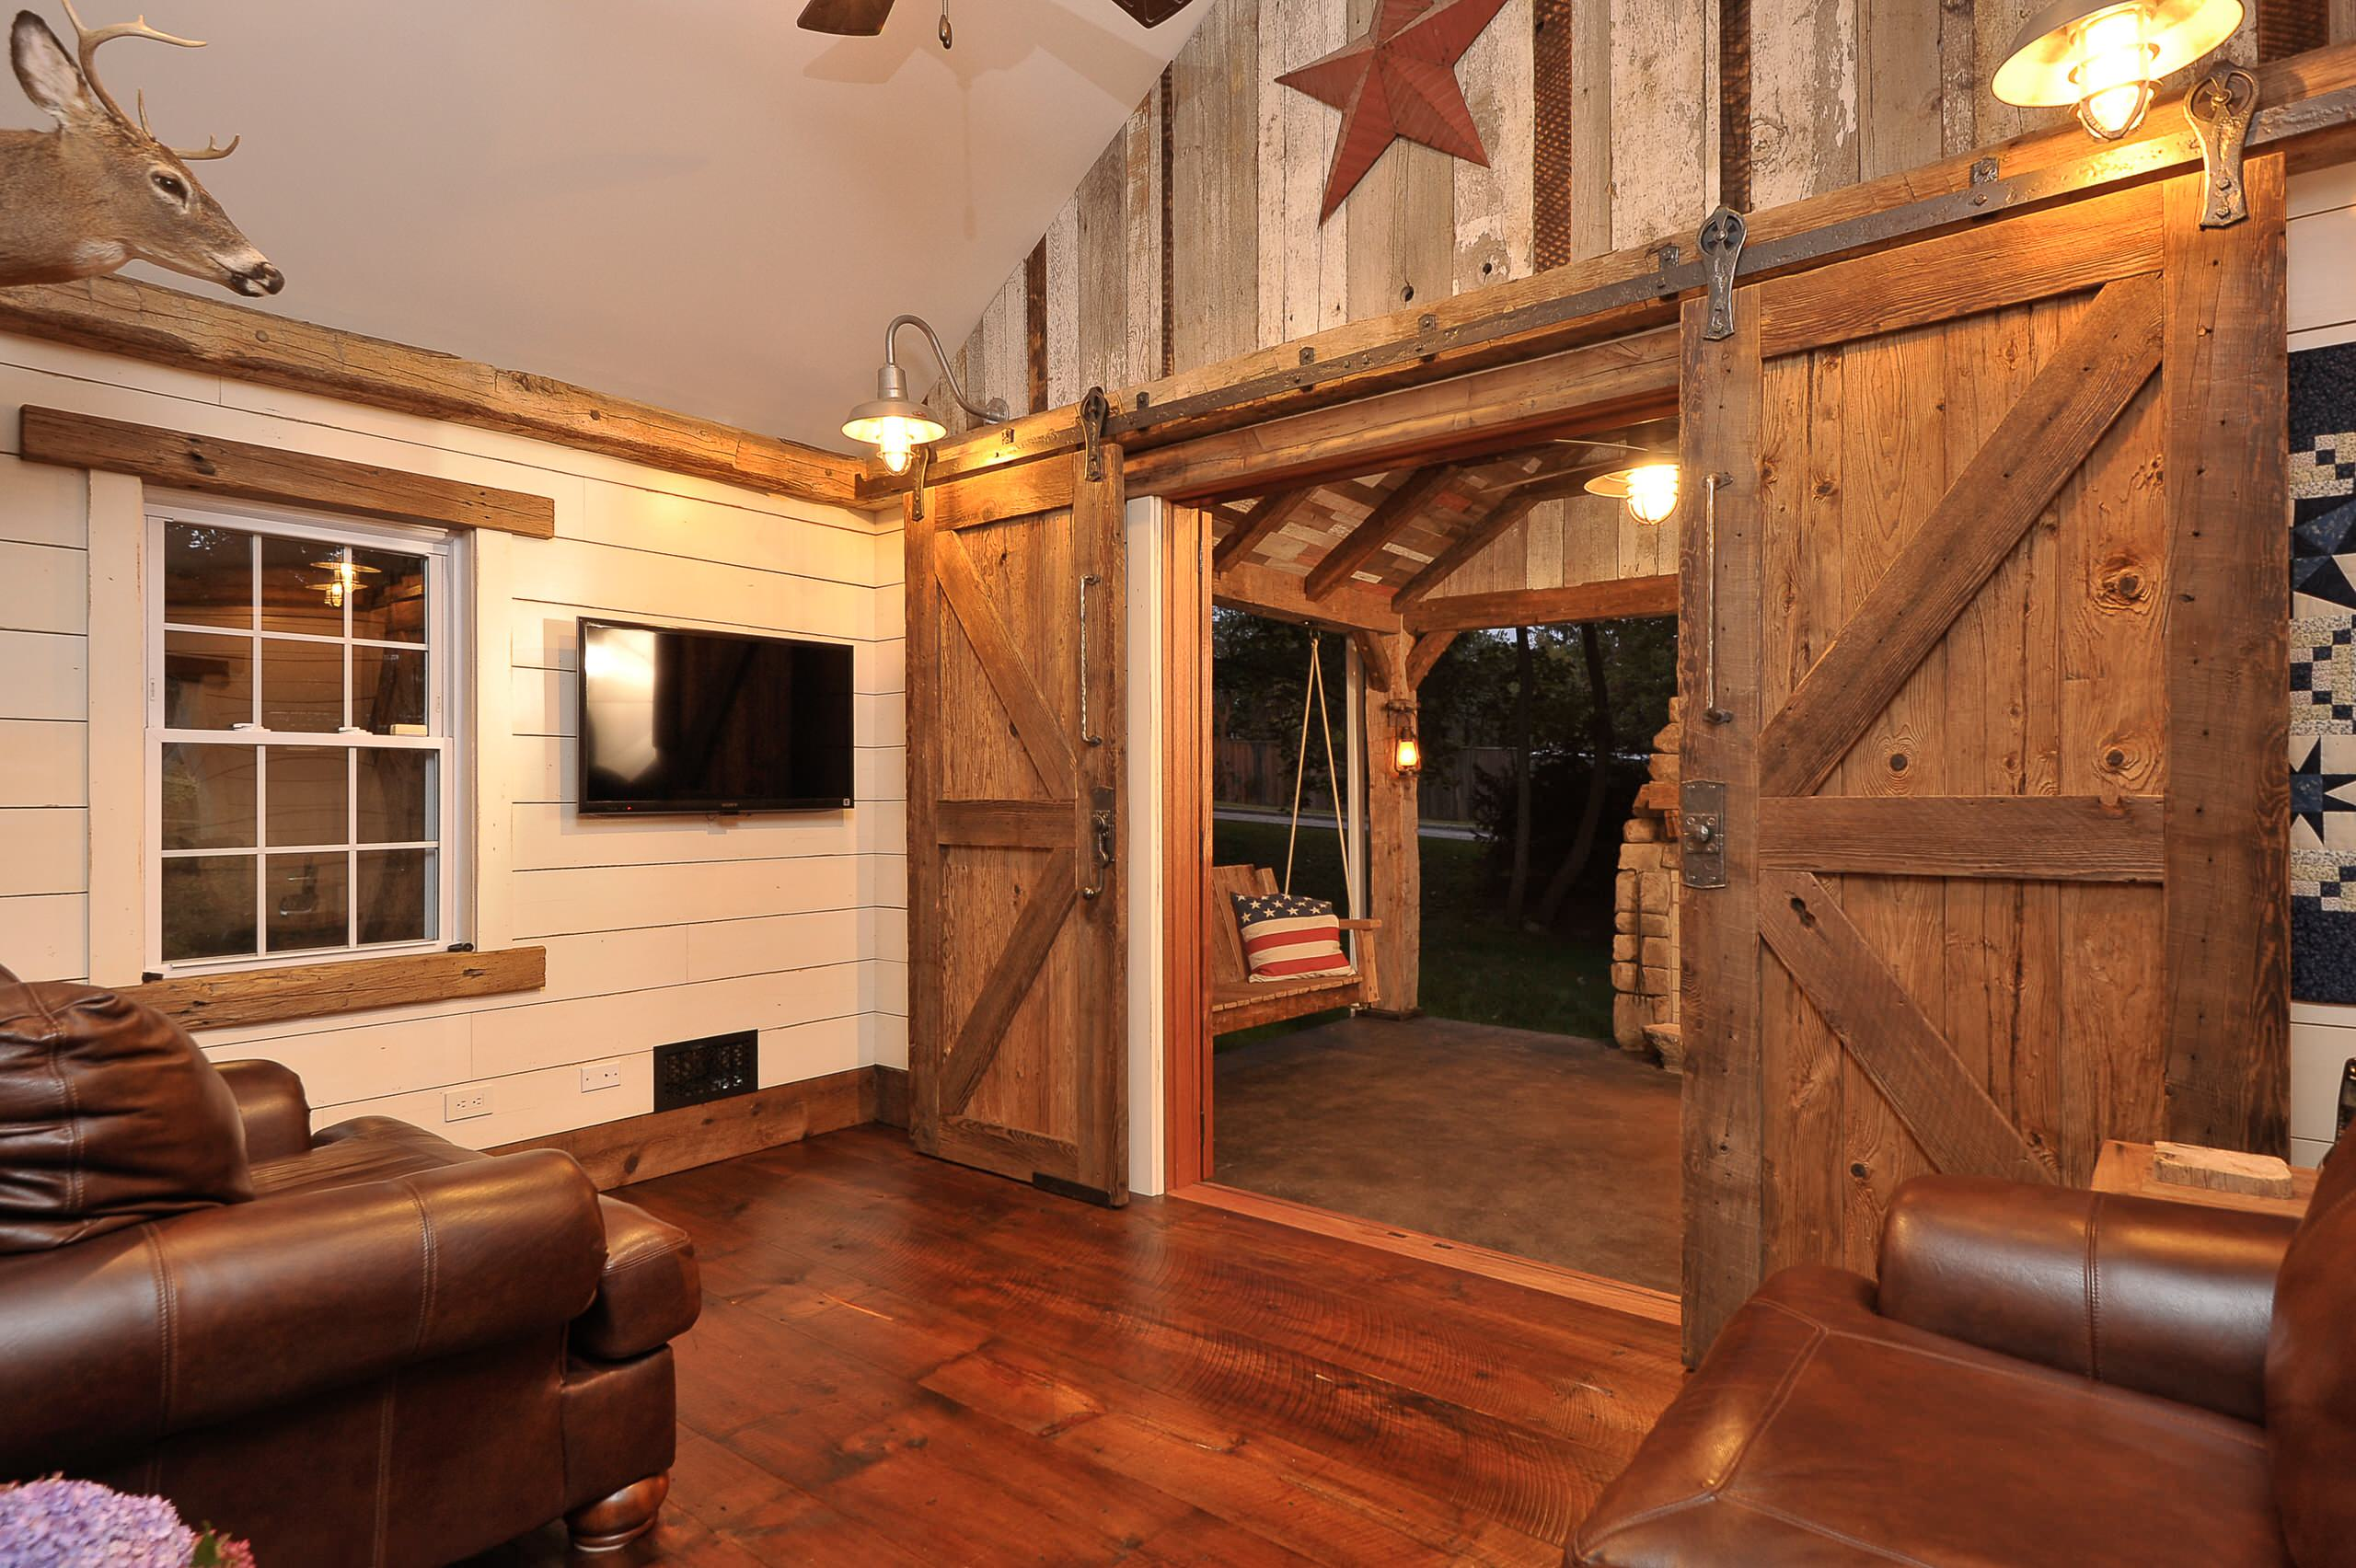 7 Barn Doors In Interior Design To Inspire Your Space Lovetoknow